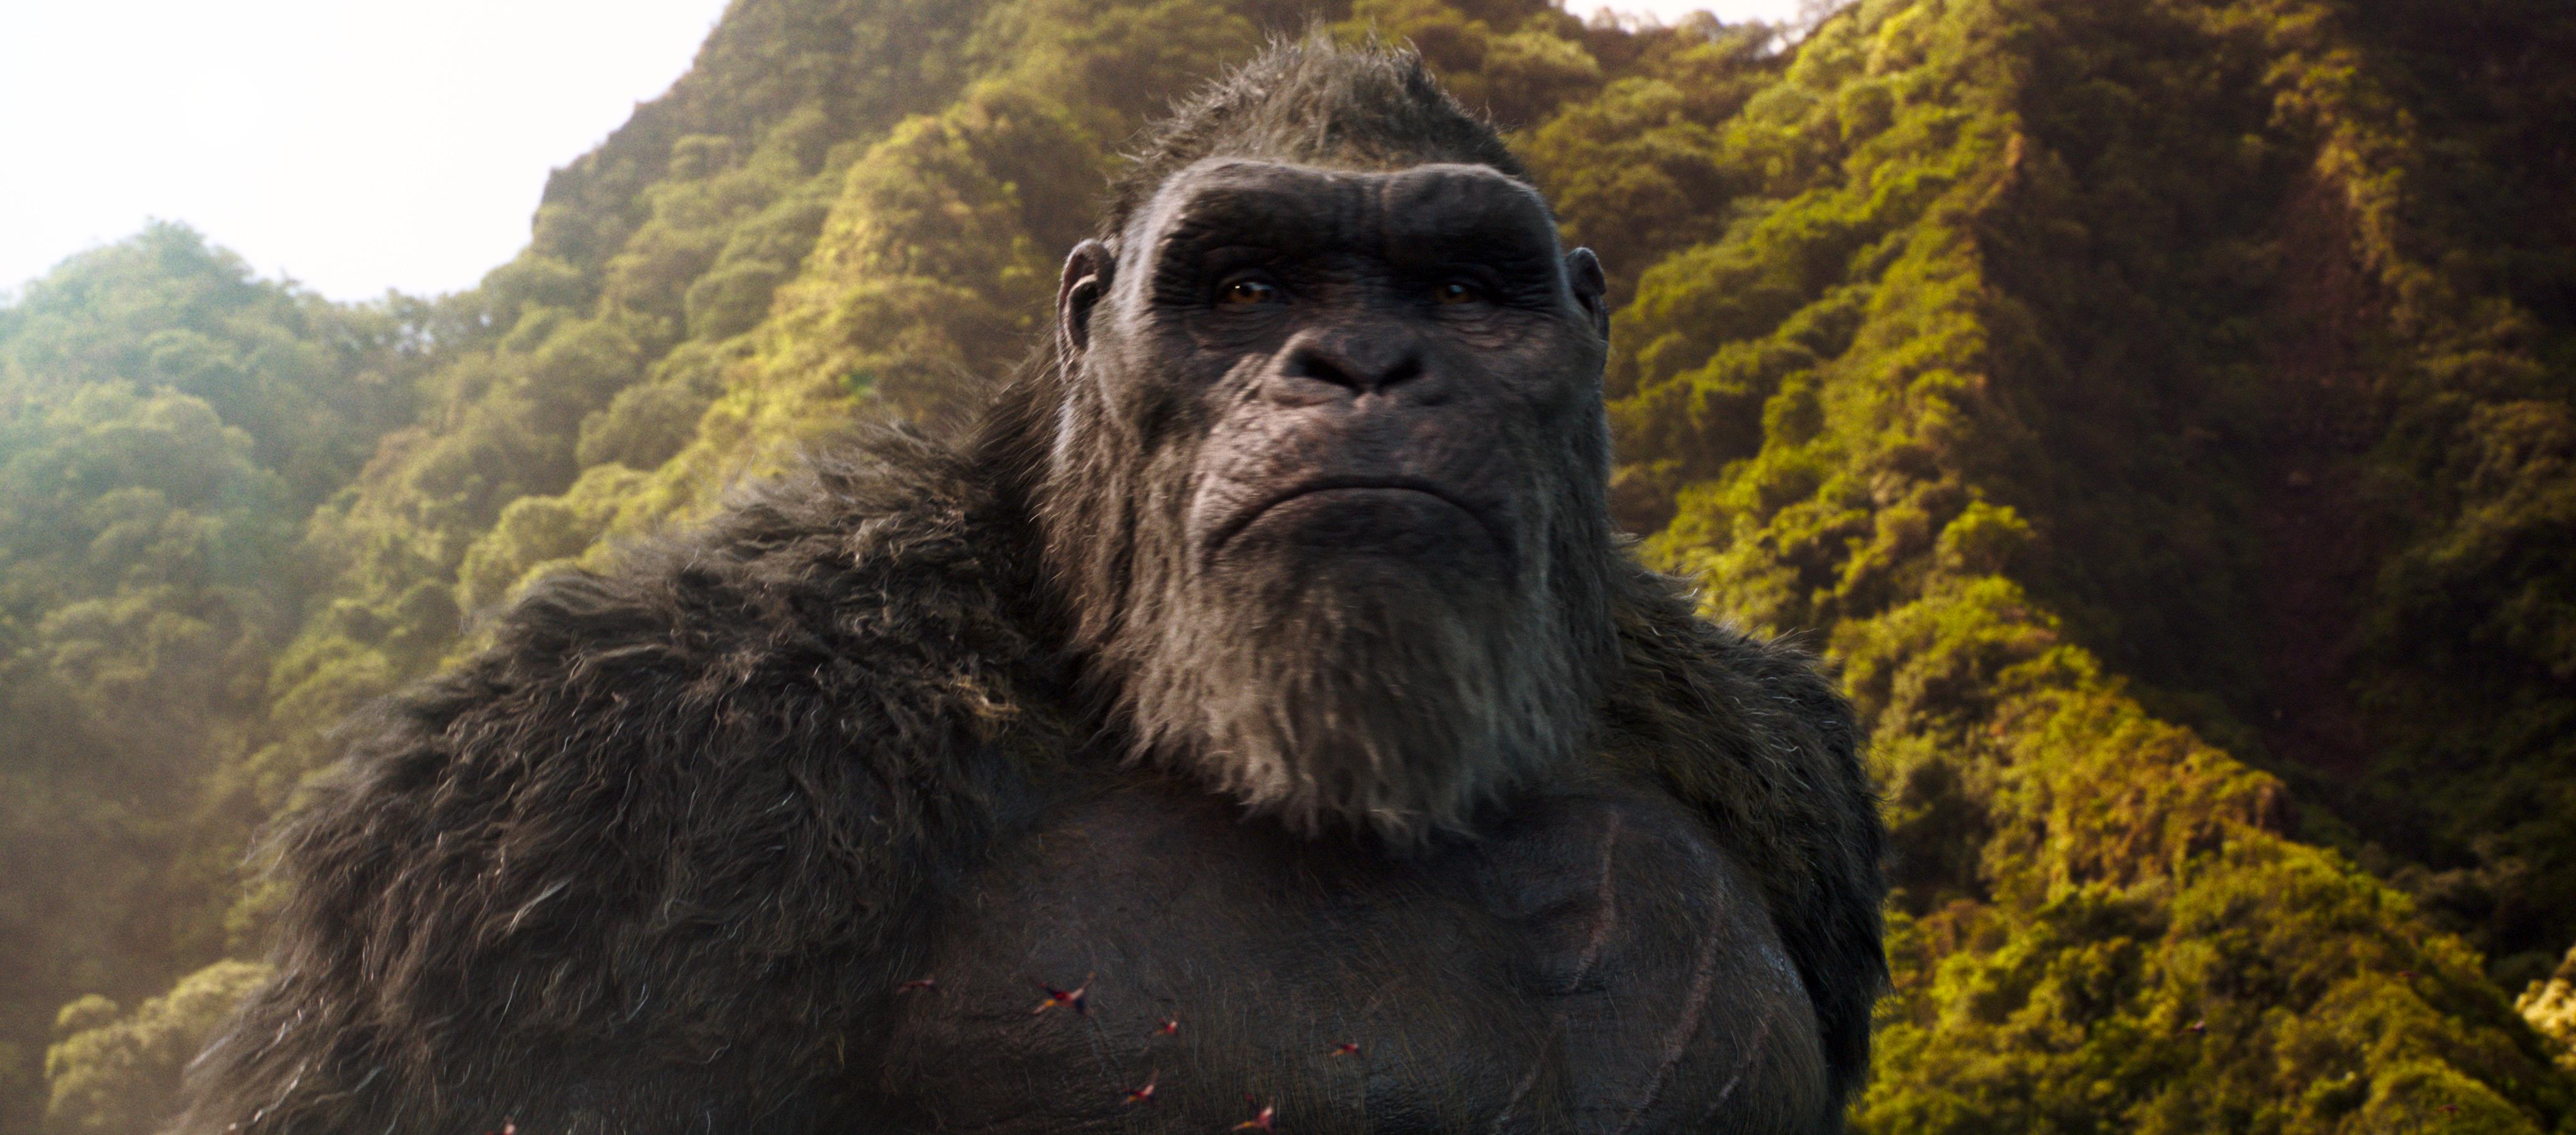 godzilla vs kong jungle 4k 1618166839 - Godzilla Vs Kong Jungle 4k - Godzilla Vs Kong Jungle 4k wallpapers